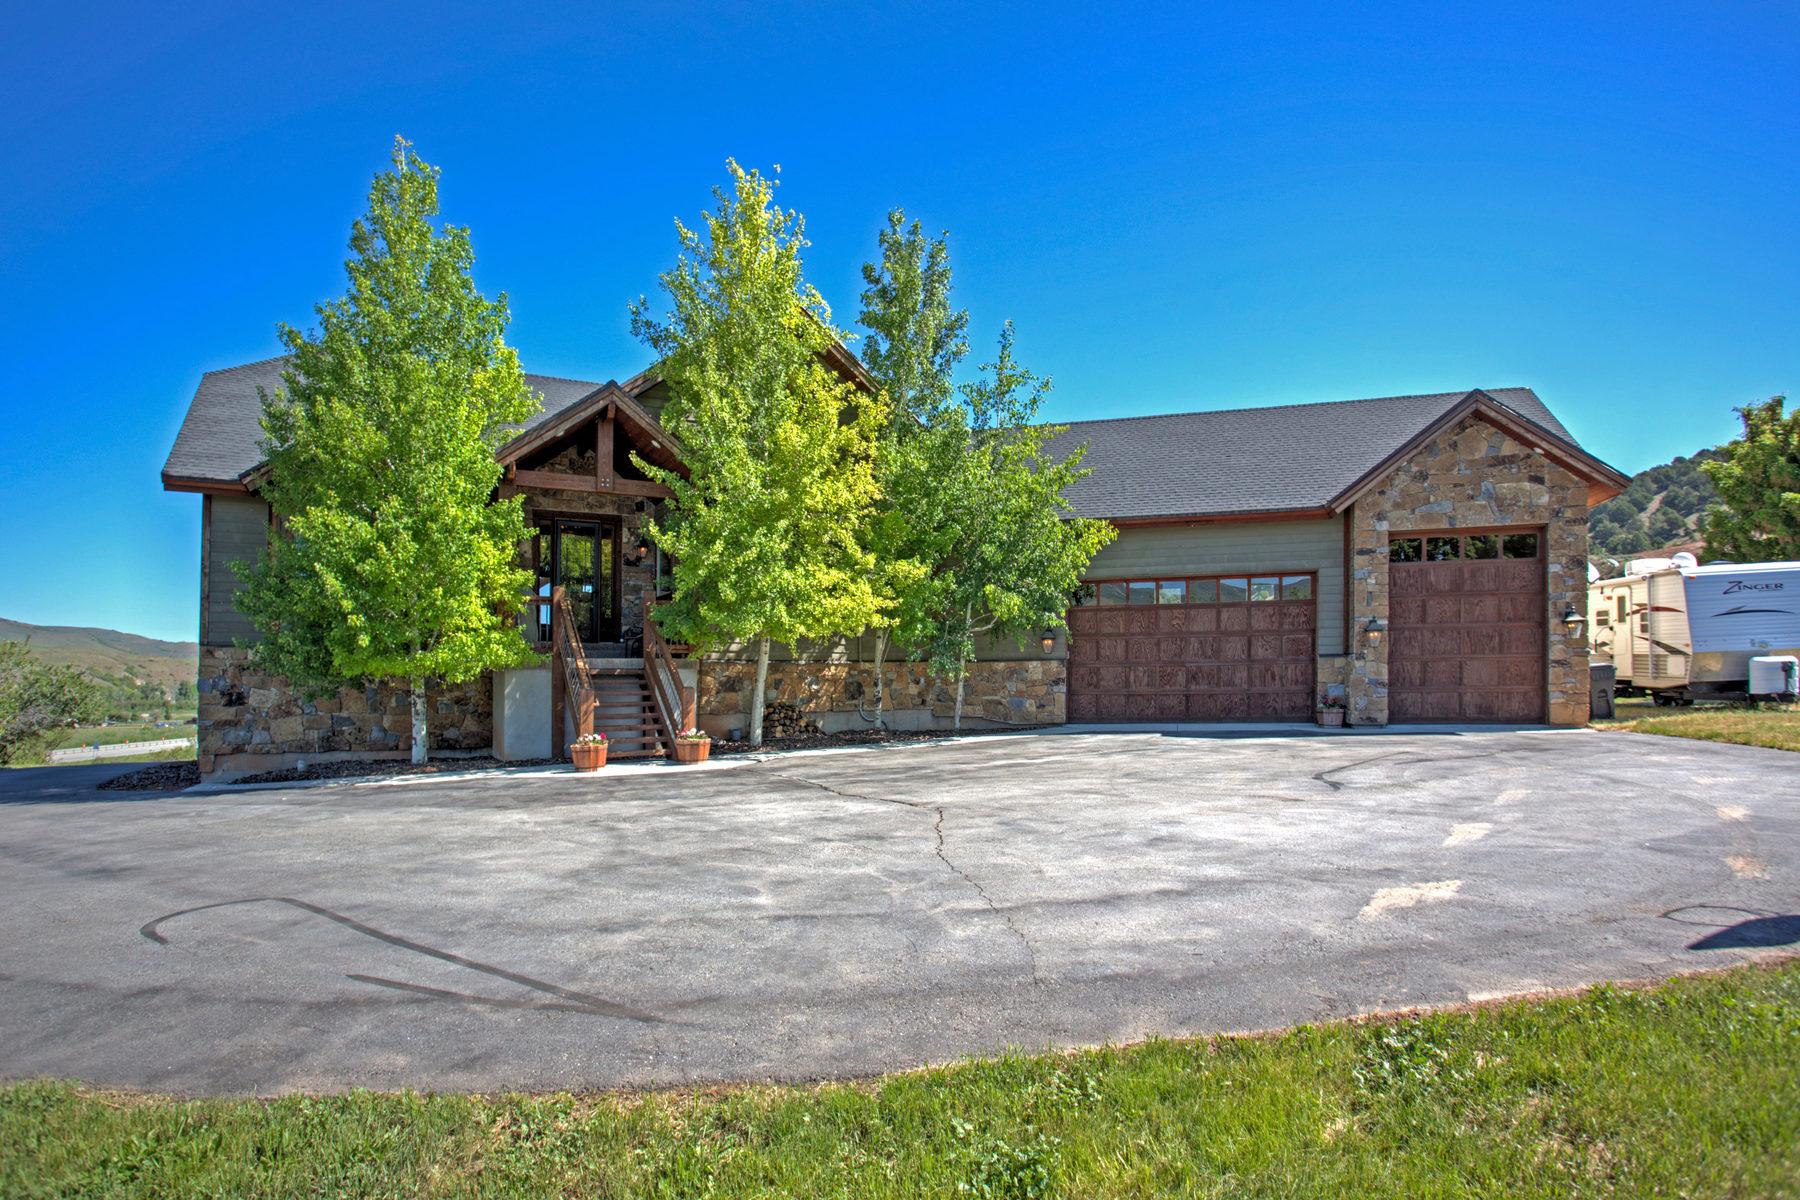 独户住宅 为 销售 在 Refined Mountain Living on 1.87 Acres 1761 S Hoytsville Rd Coalville, 犹他州 84017 美国